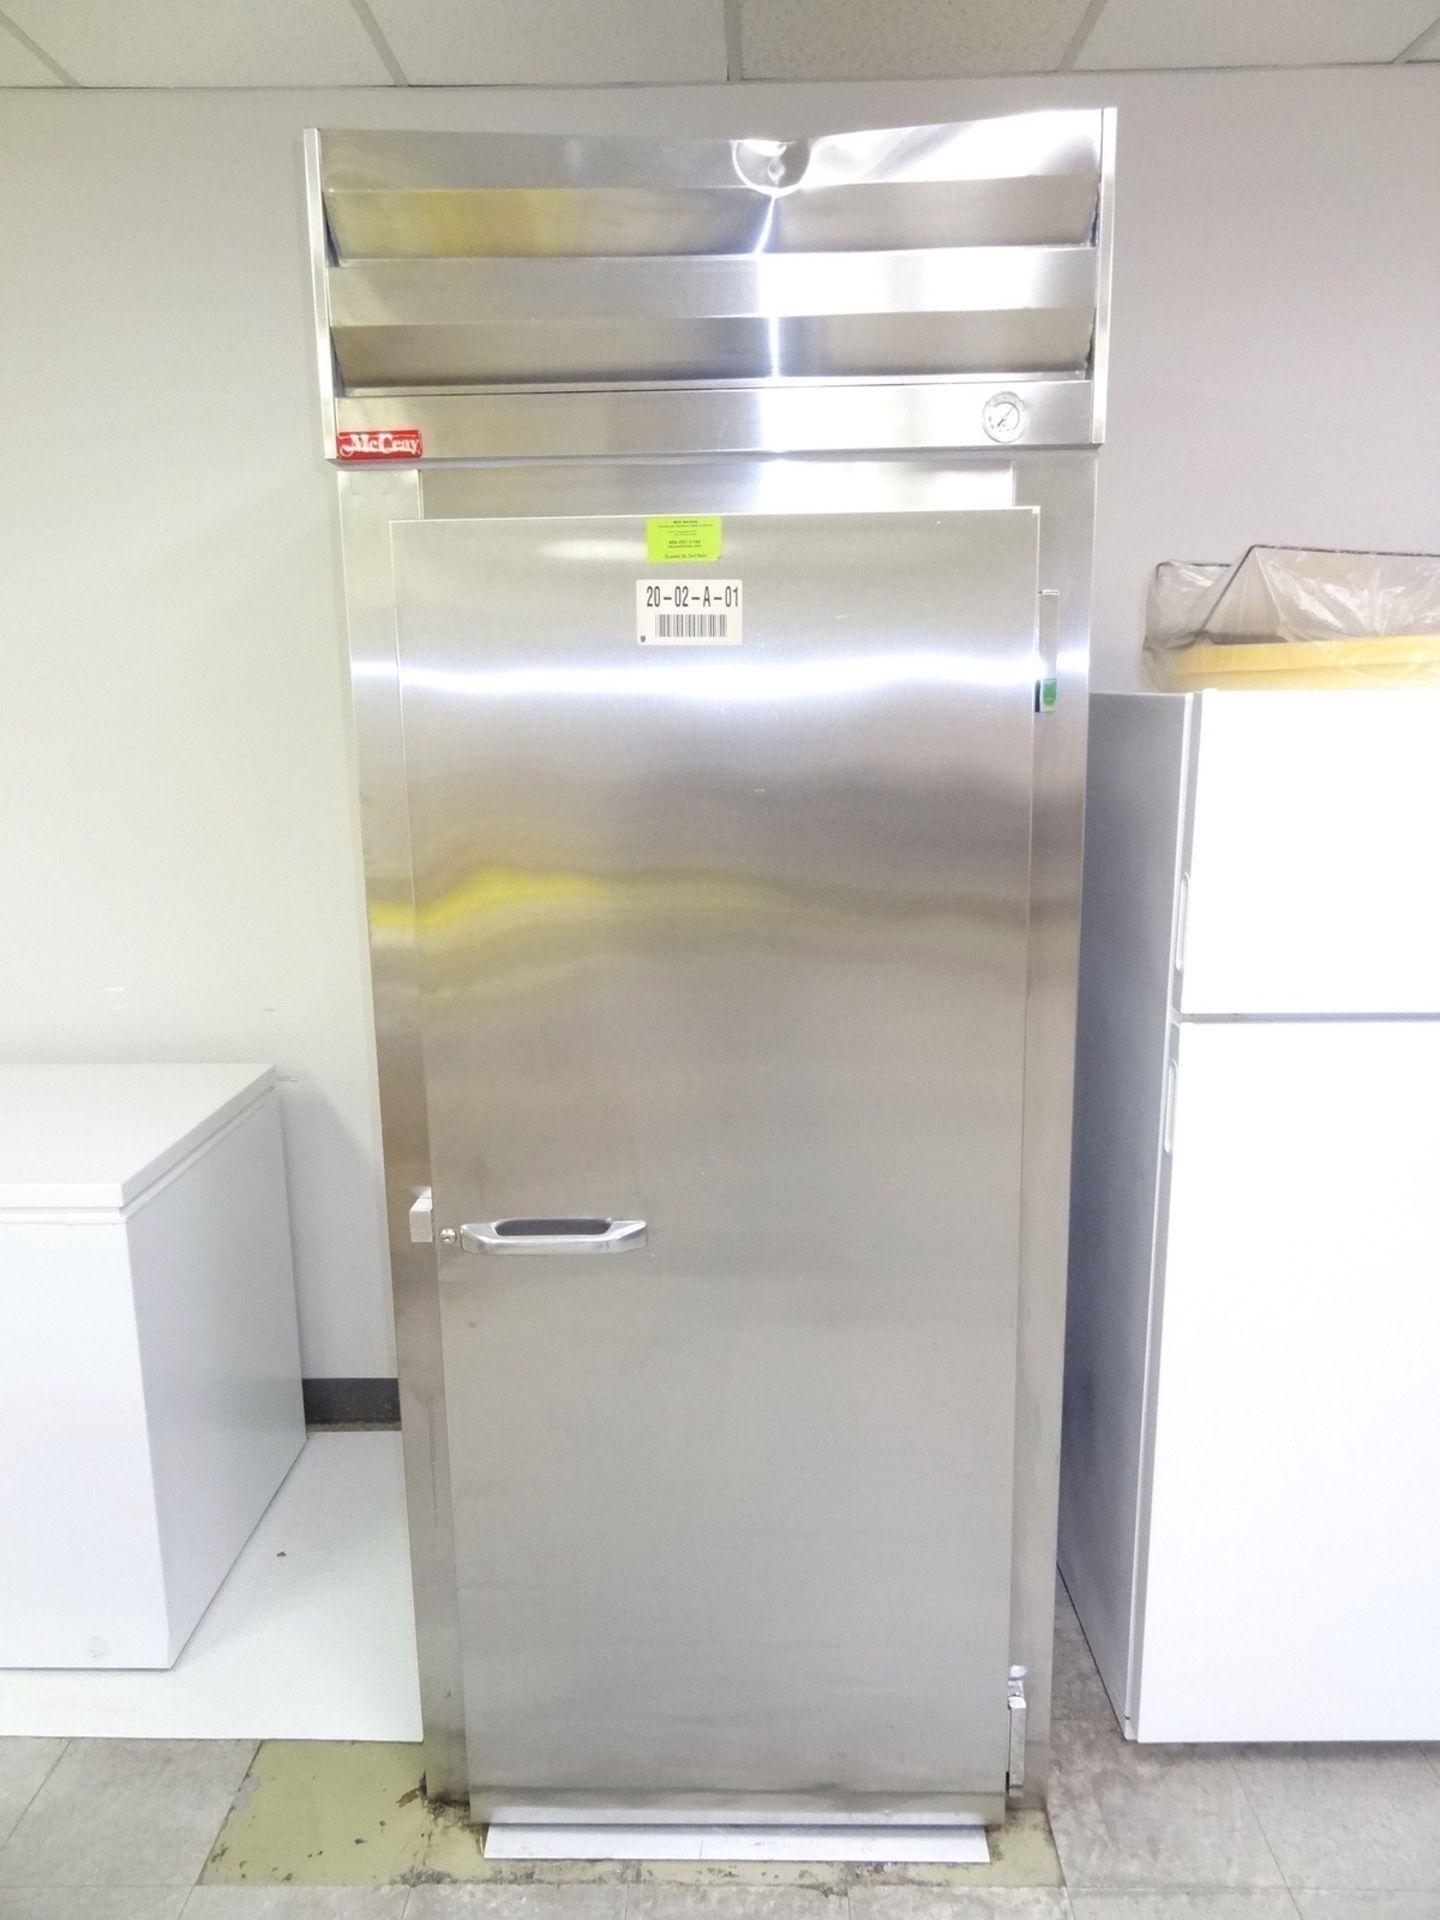 Lot 11 - McCray 55 Gallon Drum Refrigerator (Holds Drum at 42 deg) | Rig Fee: $50